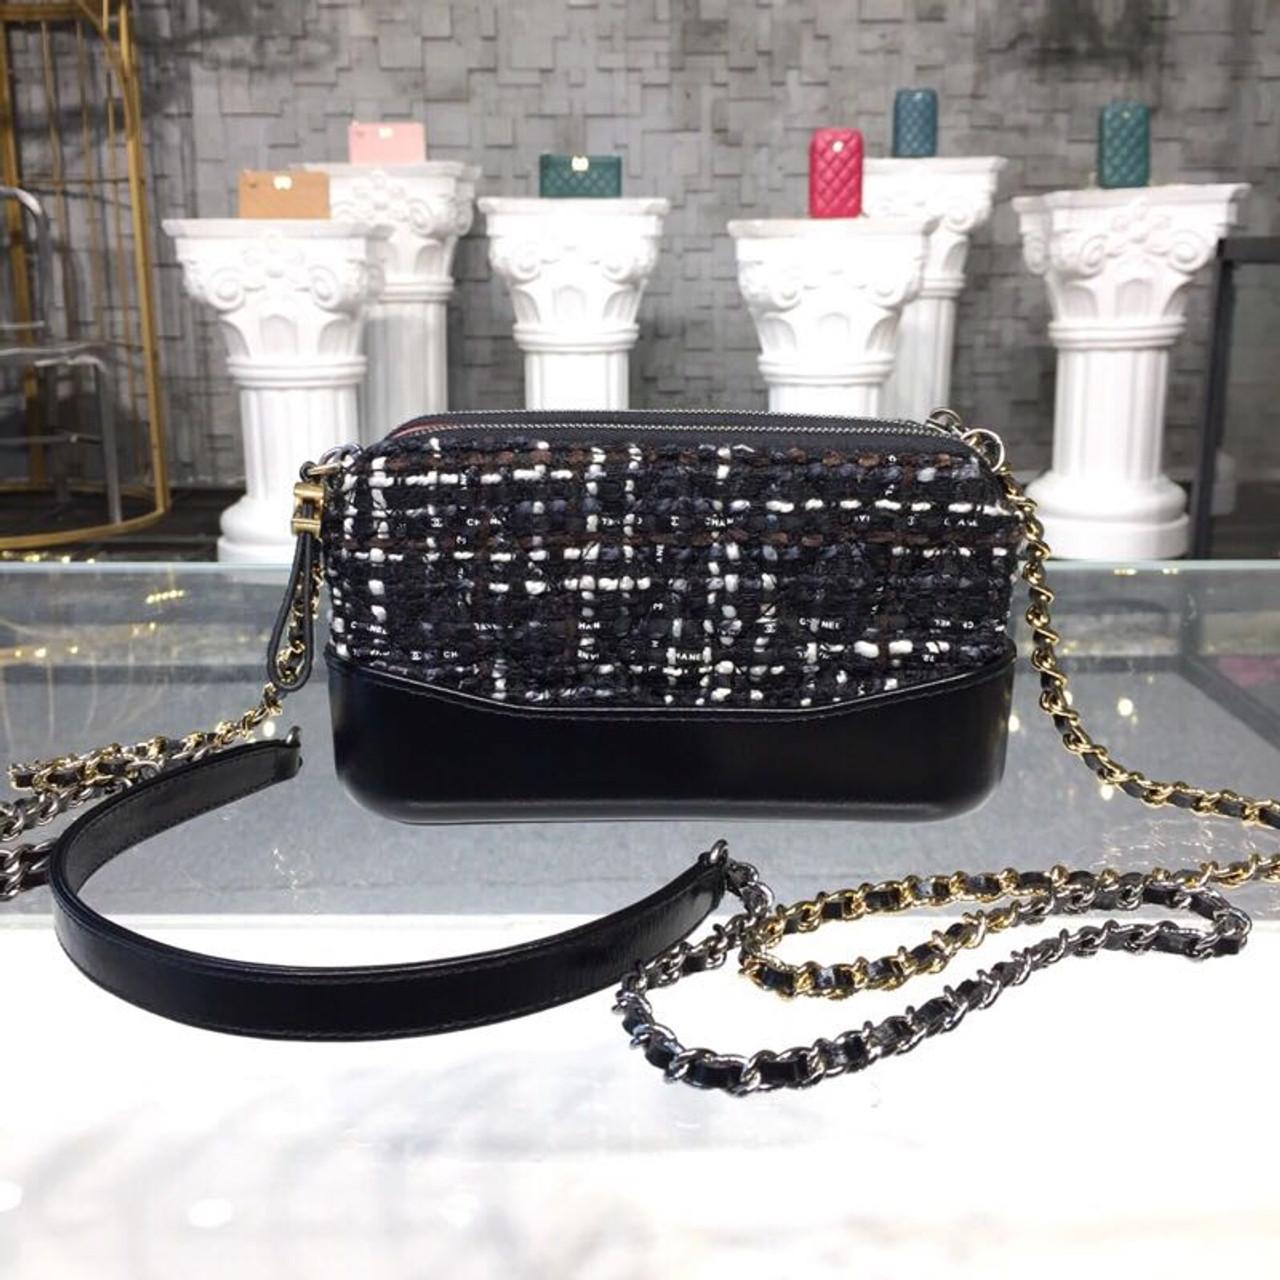 8a5663ac3486 Gabrielle Mini Hobo Bag 18cm Gold Hardware Tweed/Lambskin Leather Fall/Winter  Act 1